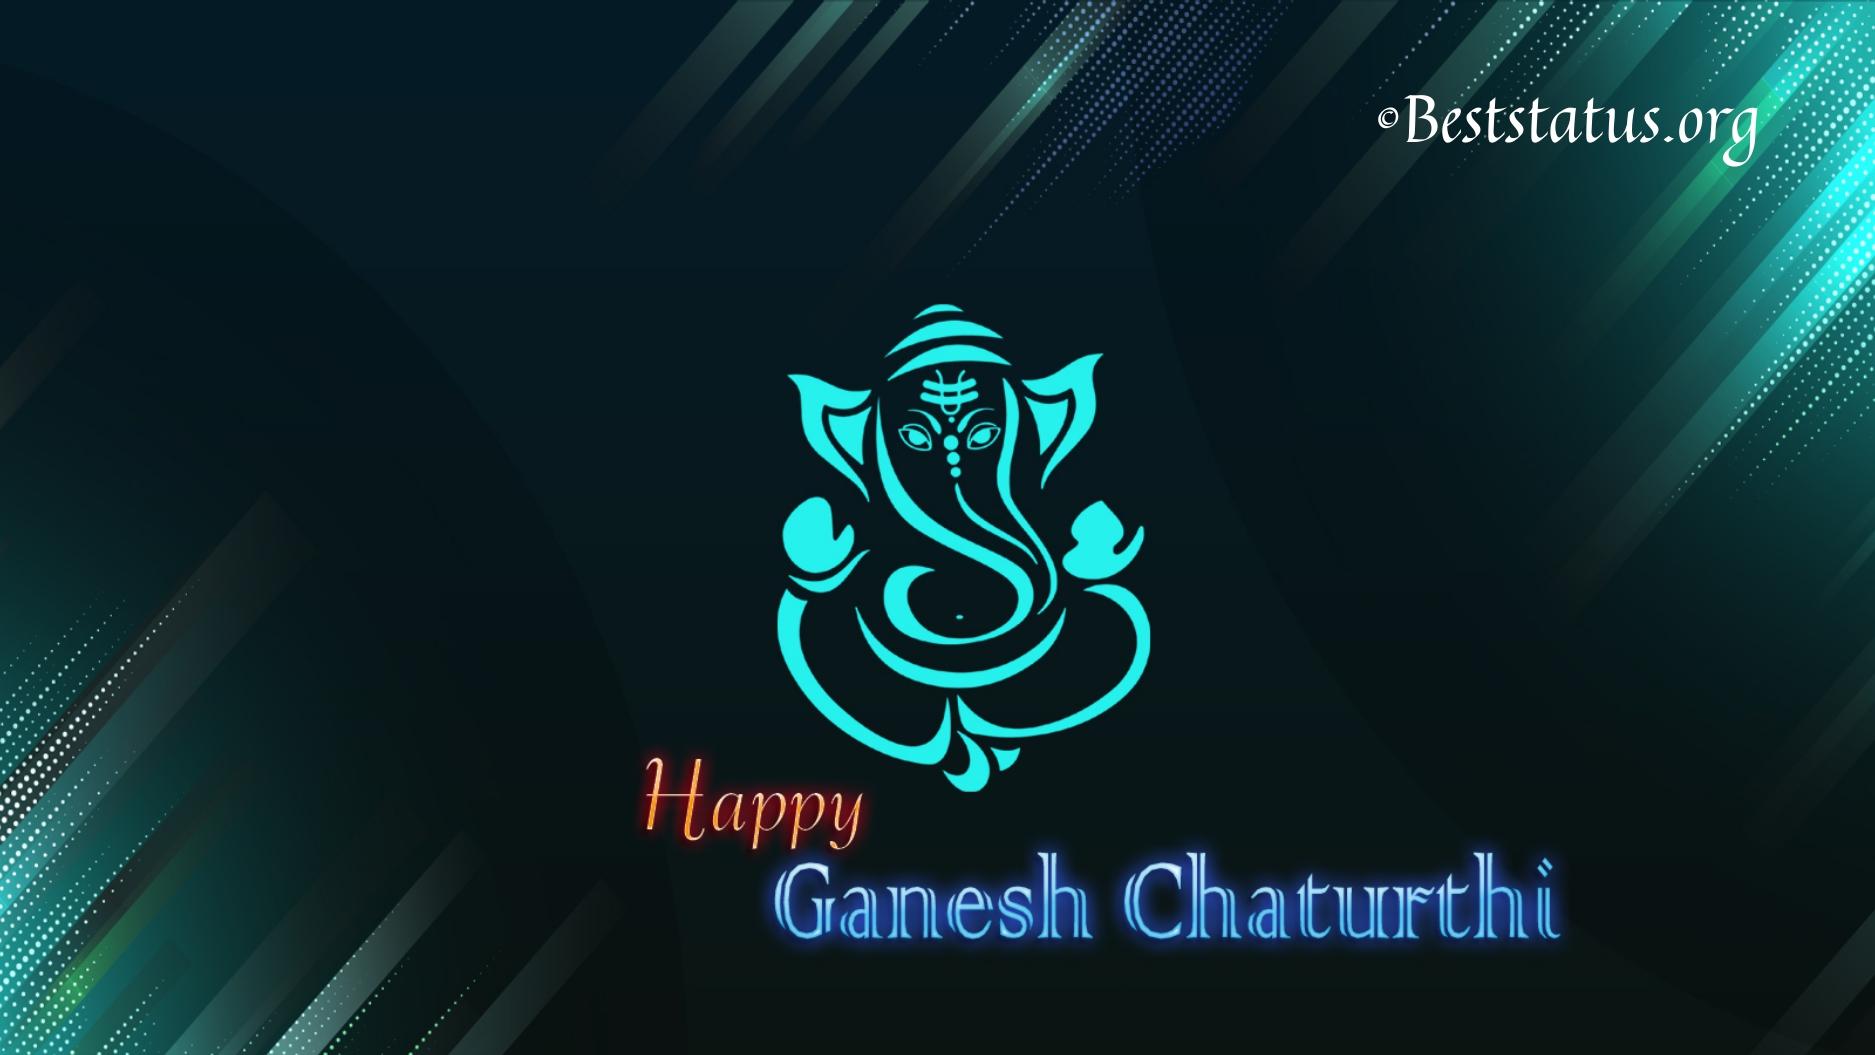 Ganesh Chaturthi Best Status   Happy Ganesh Jayanti messages, Wishes, SMS, Quotes 2021